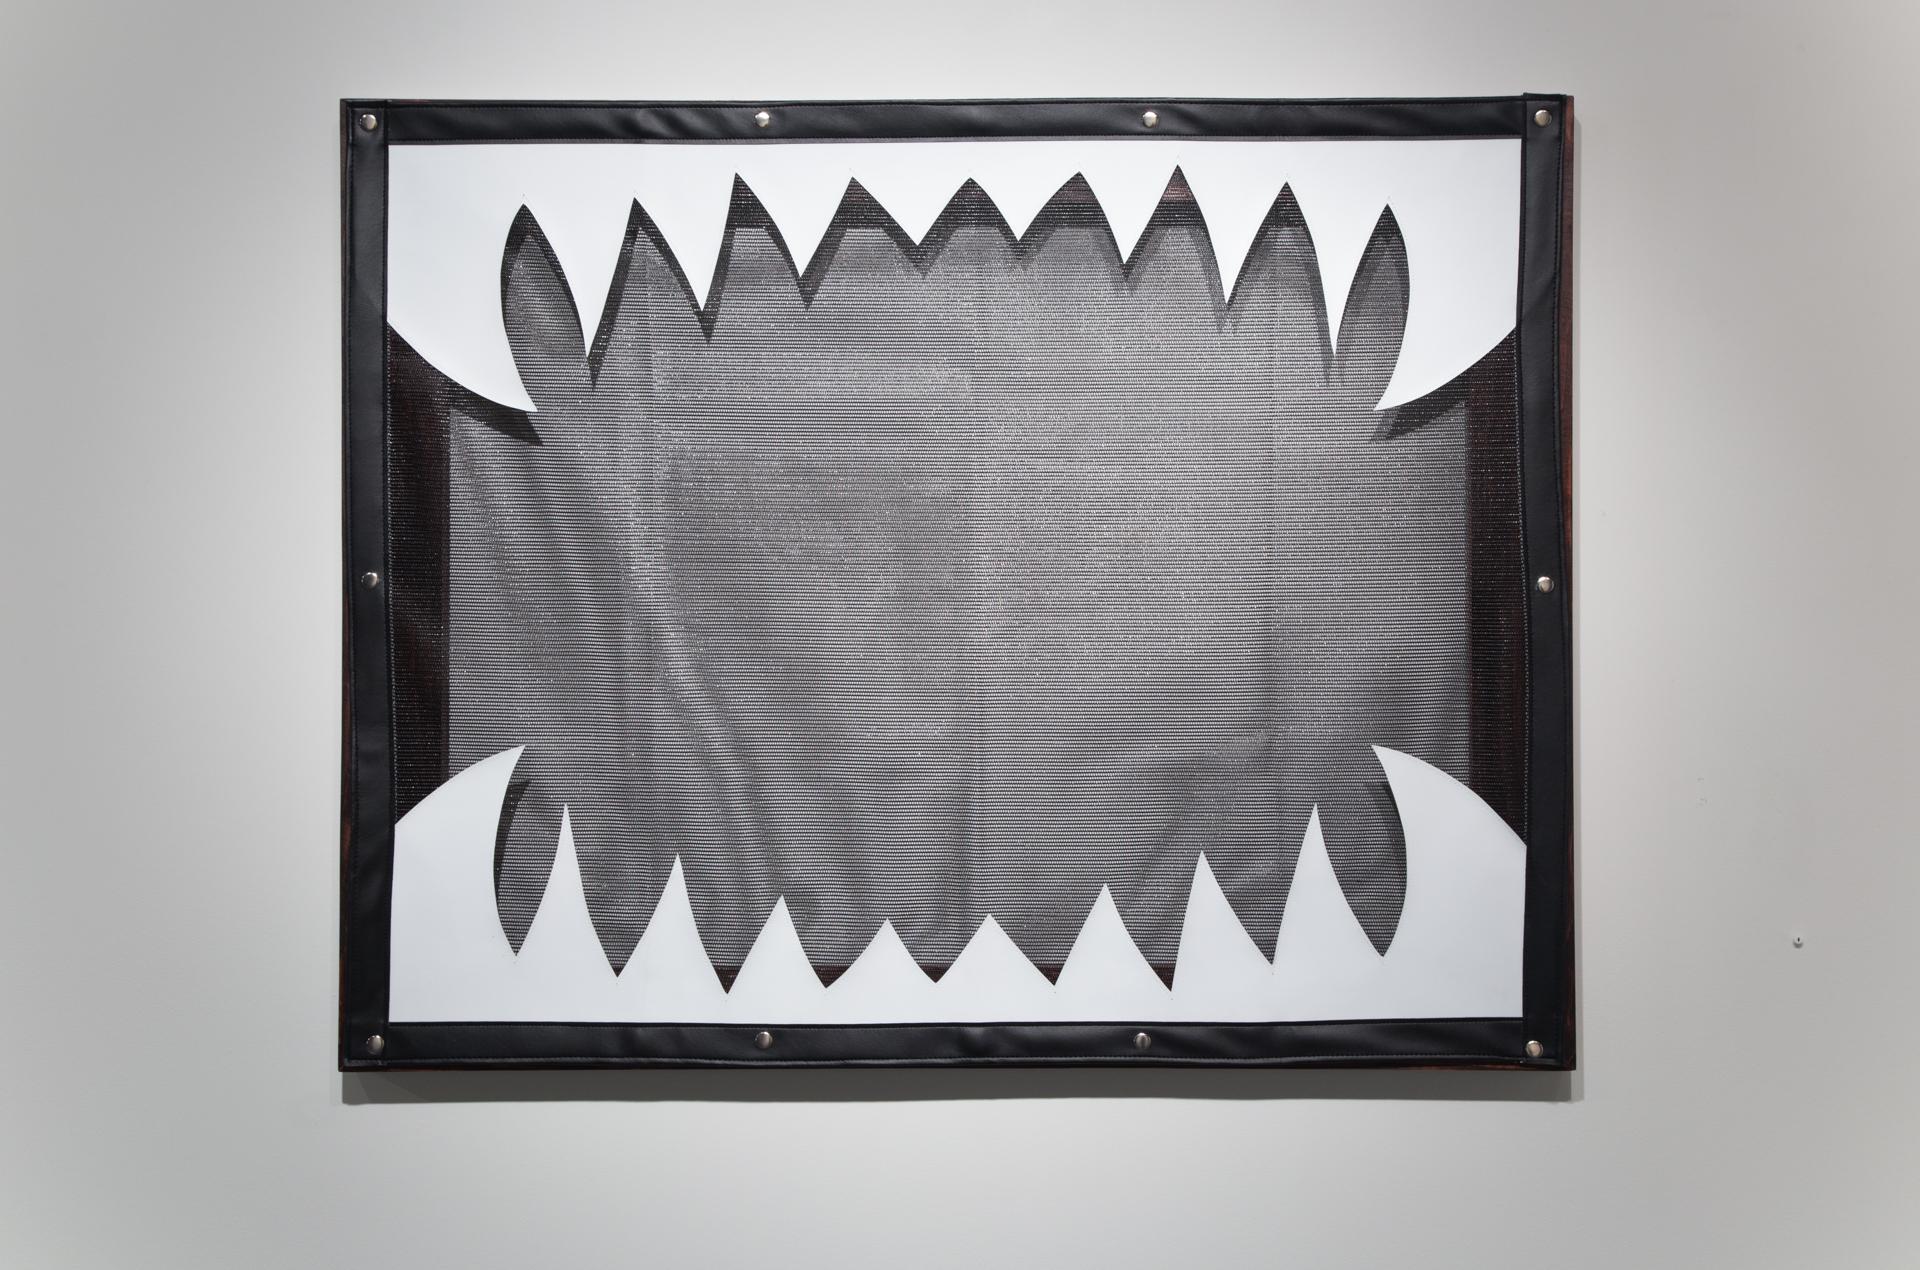 """FLD 120 Classic Jaws Teeth"" Cody Justus"